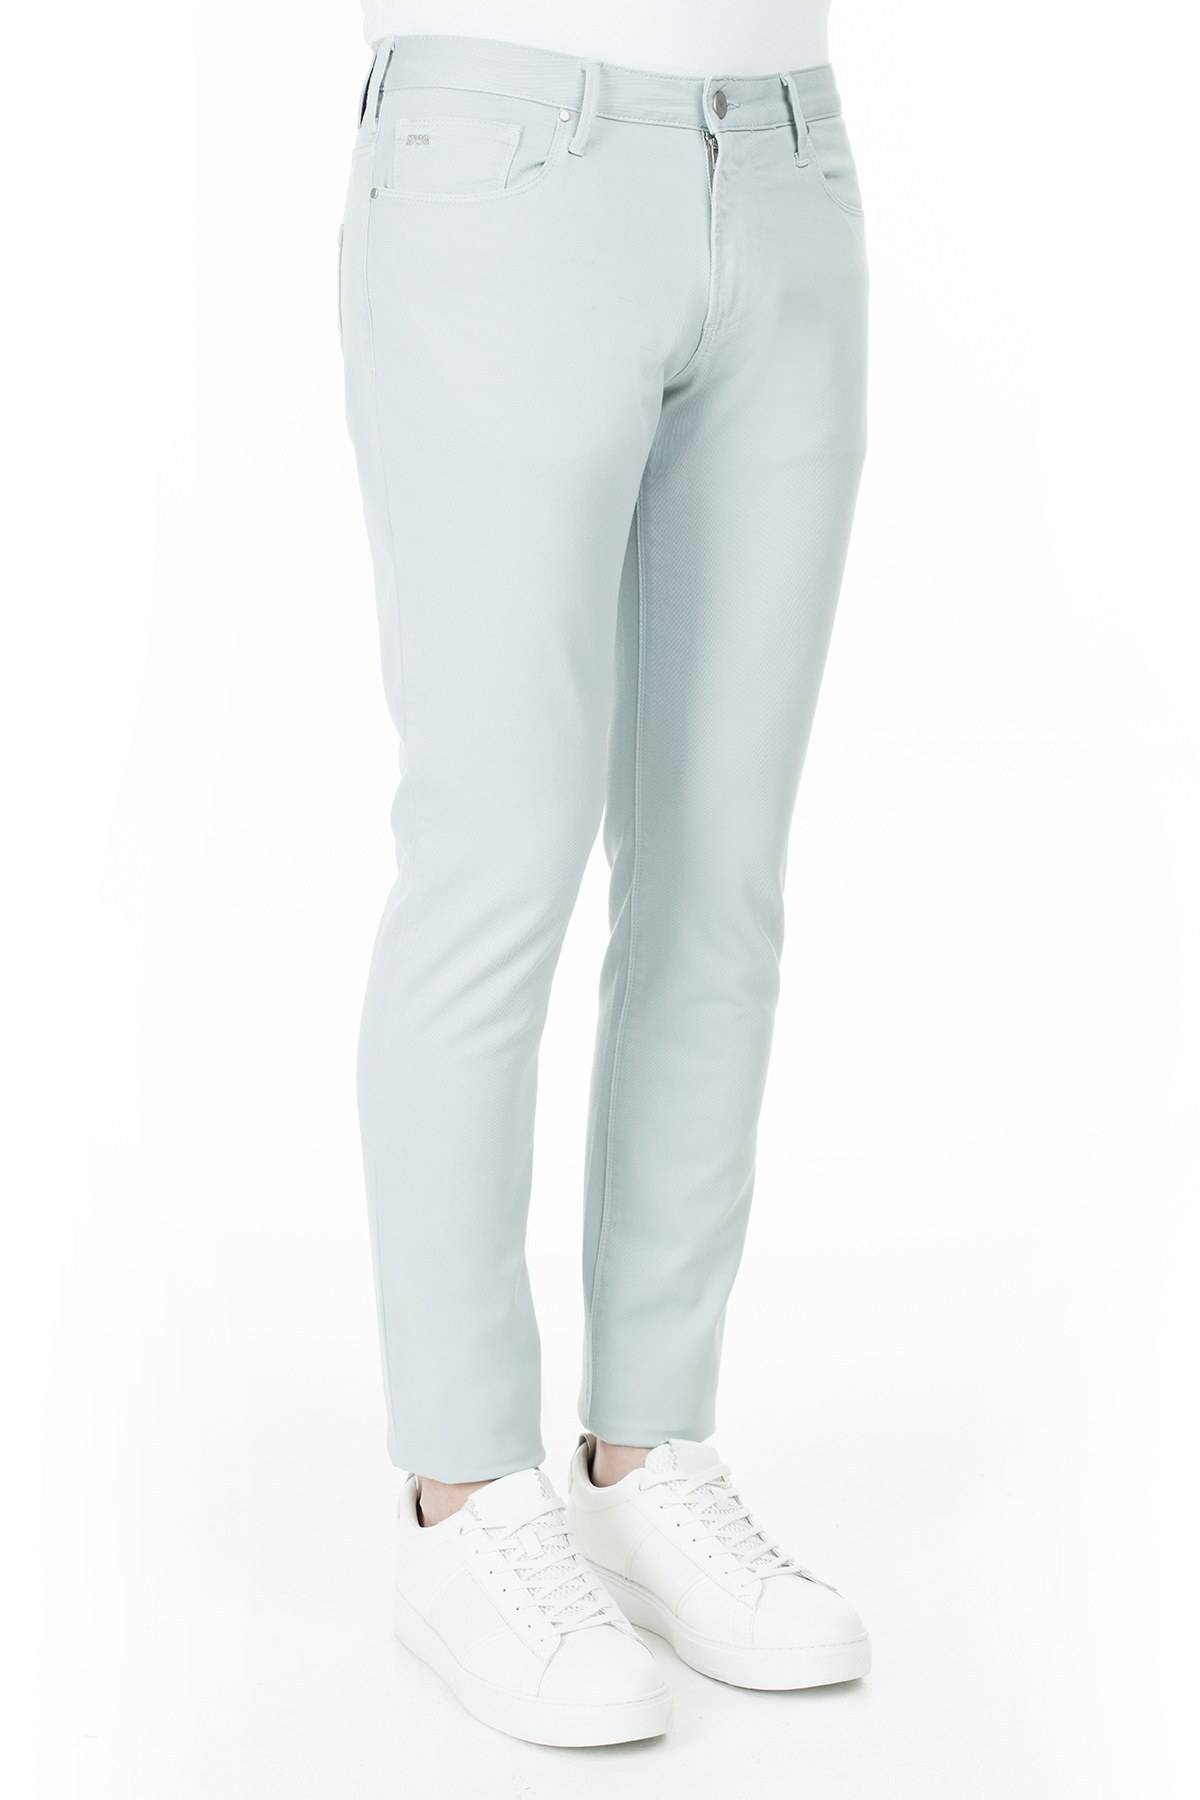 Emporio Armani J06 Jeans Erkek Pamuklu Pantolon 3H1J06 1N8XZ 0756 AÇIK MAVİ